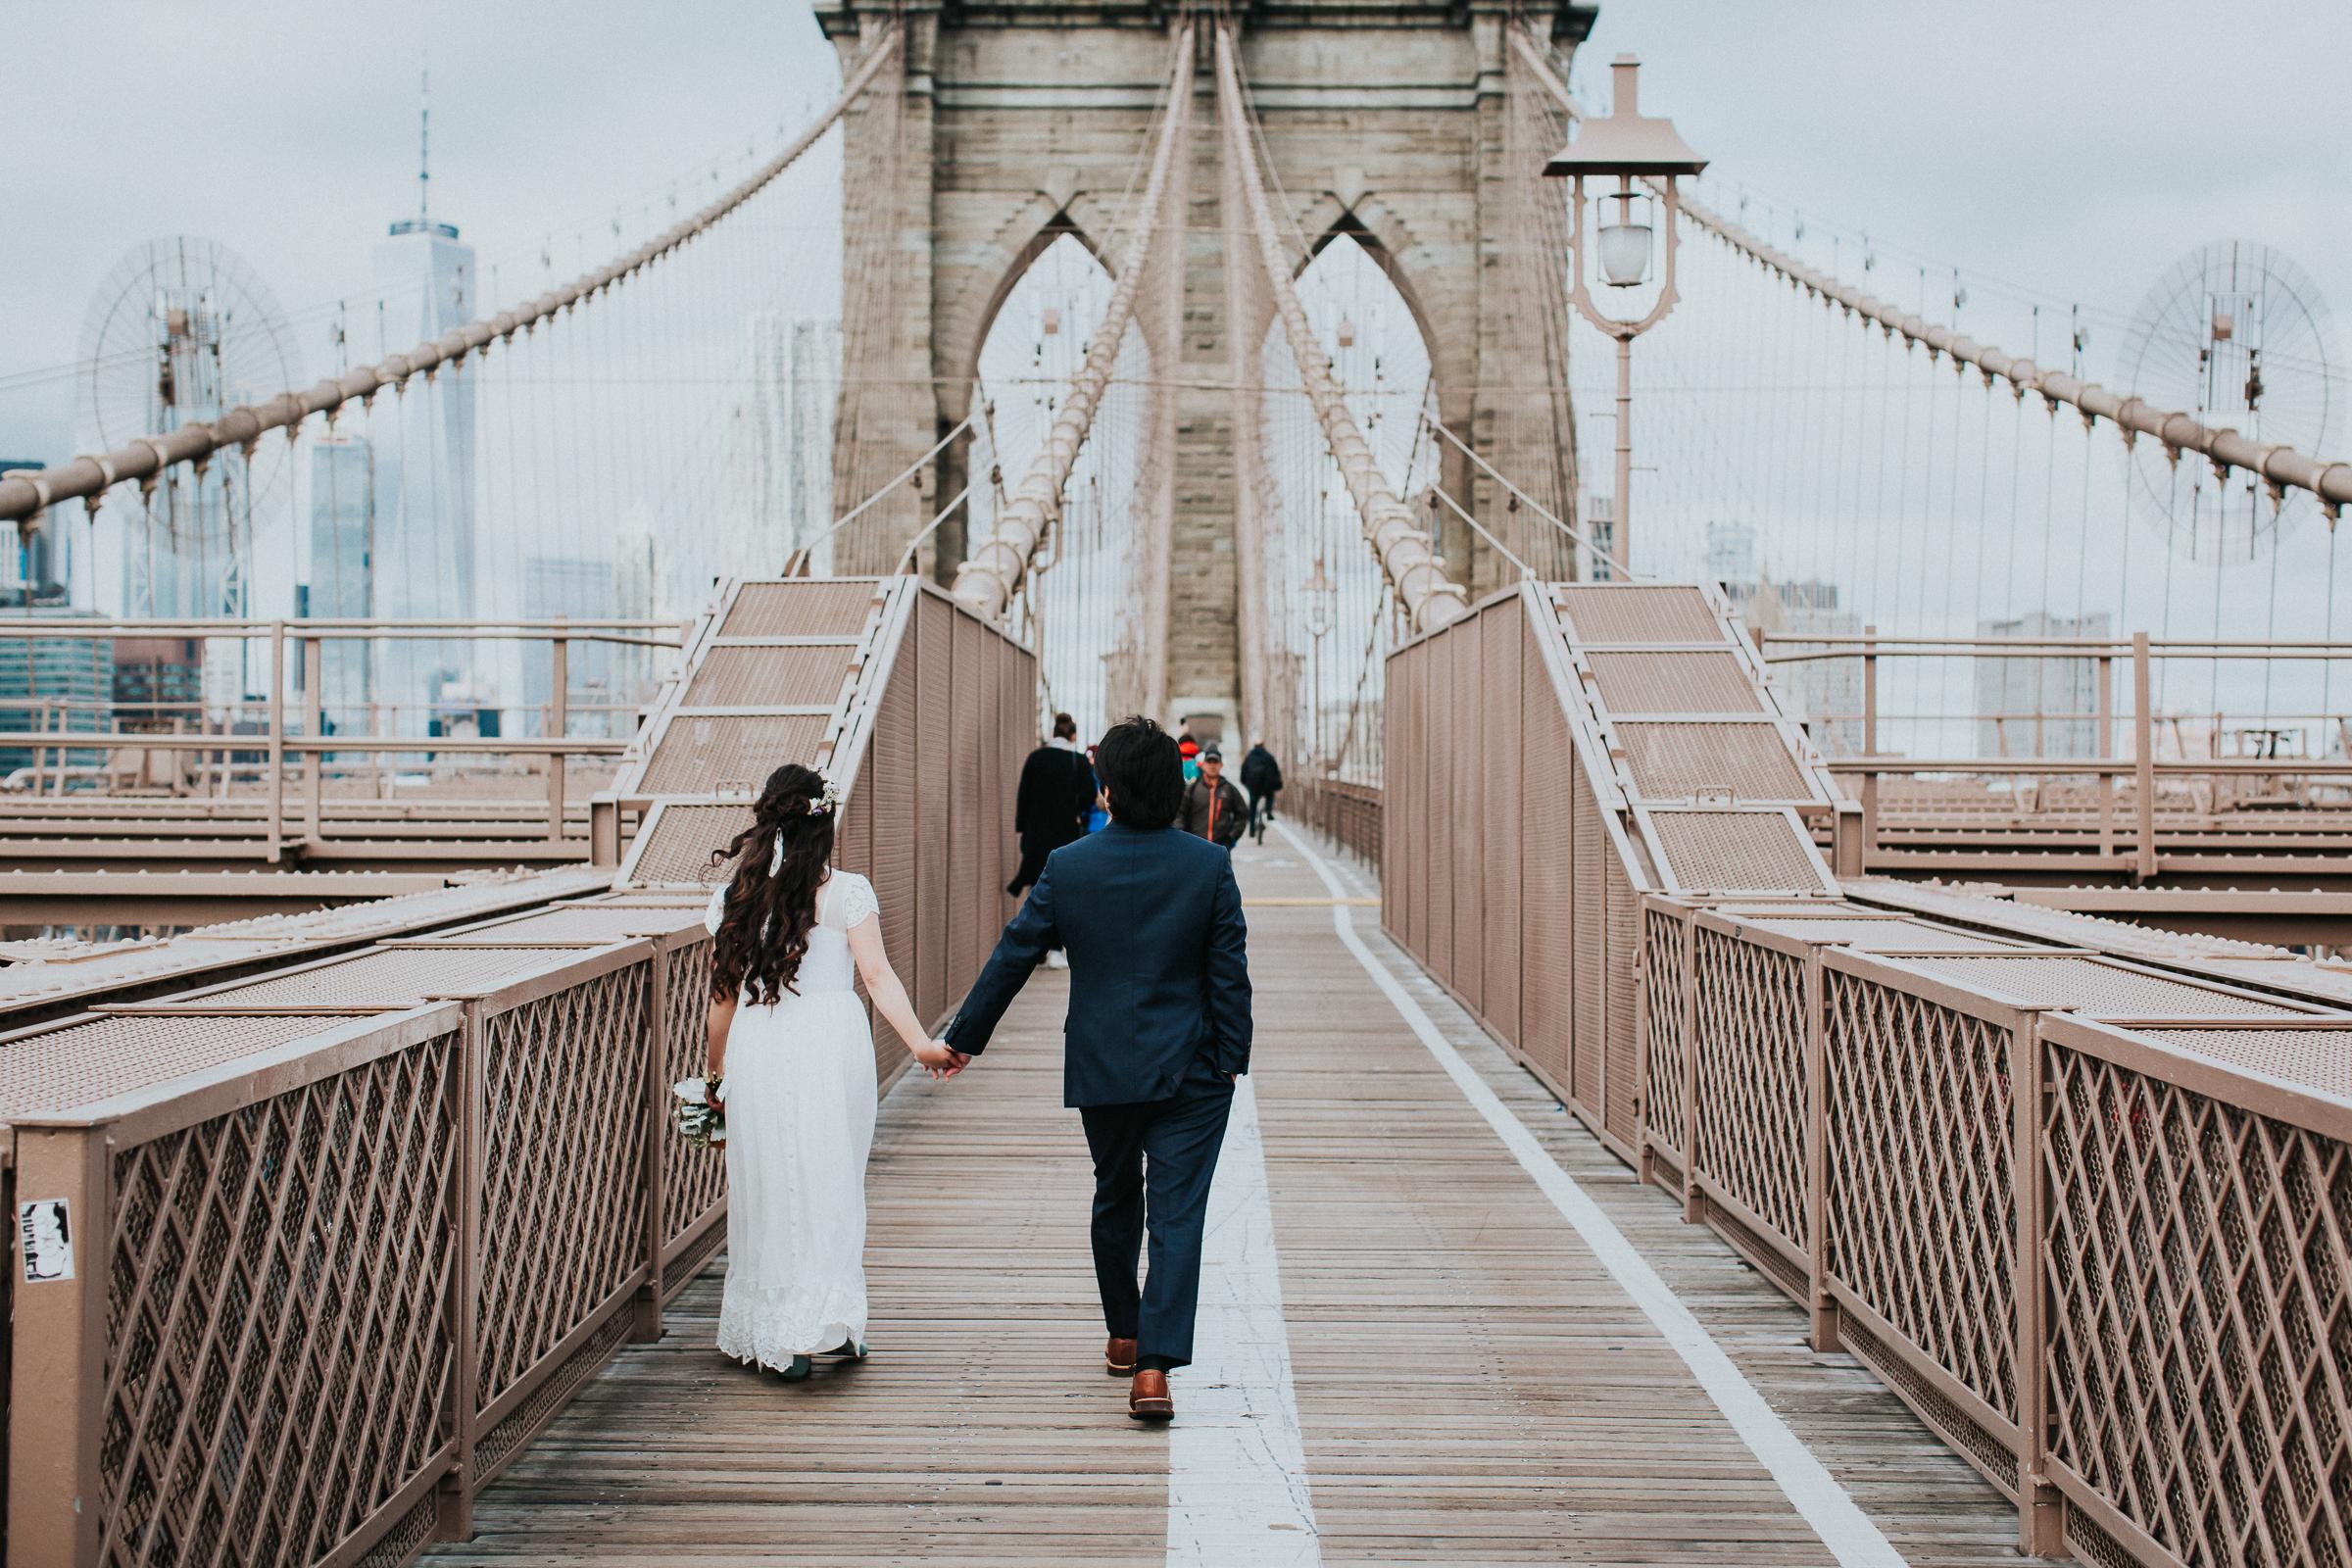 Central-Park-Brooklyn-Bridge-Dumbo-NYC-Documentary-Wedding-Photographer-27.jpg